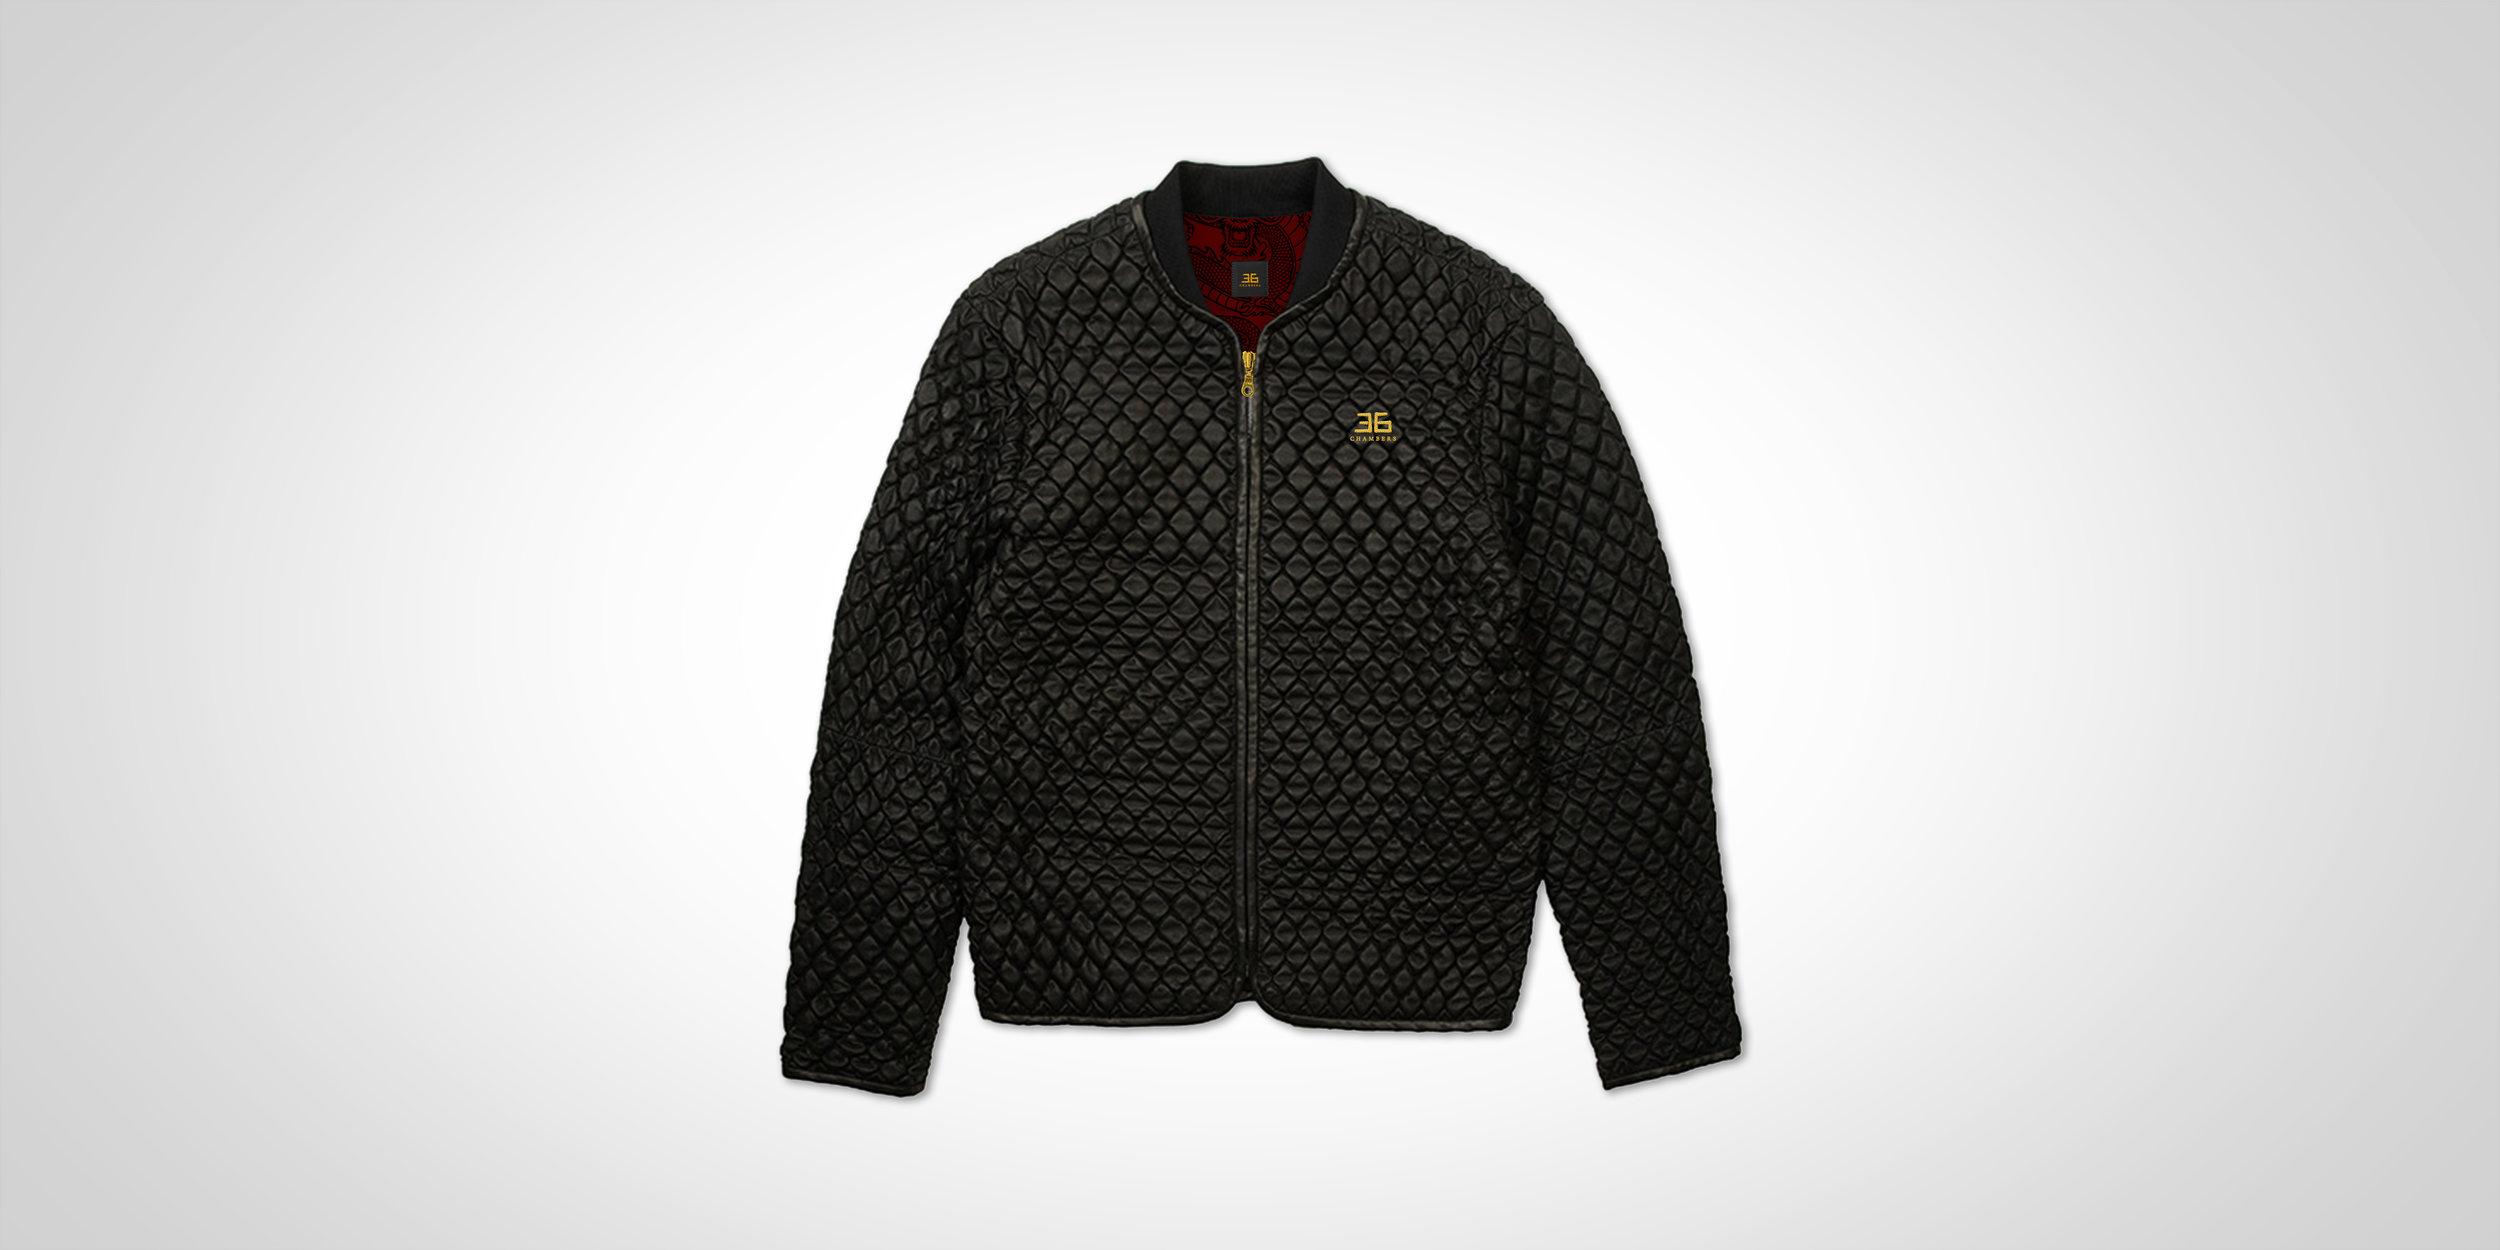 36Chambers Dragon Jacket.jpg